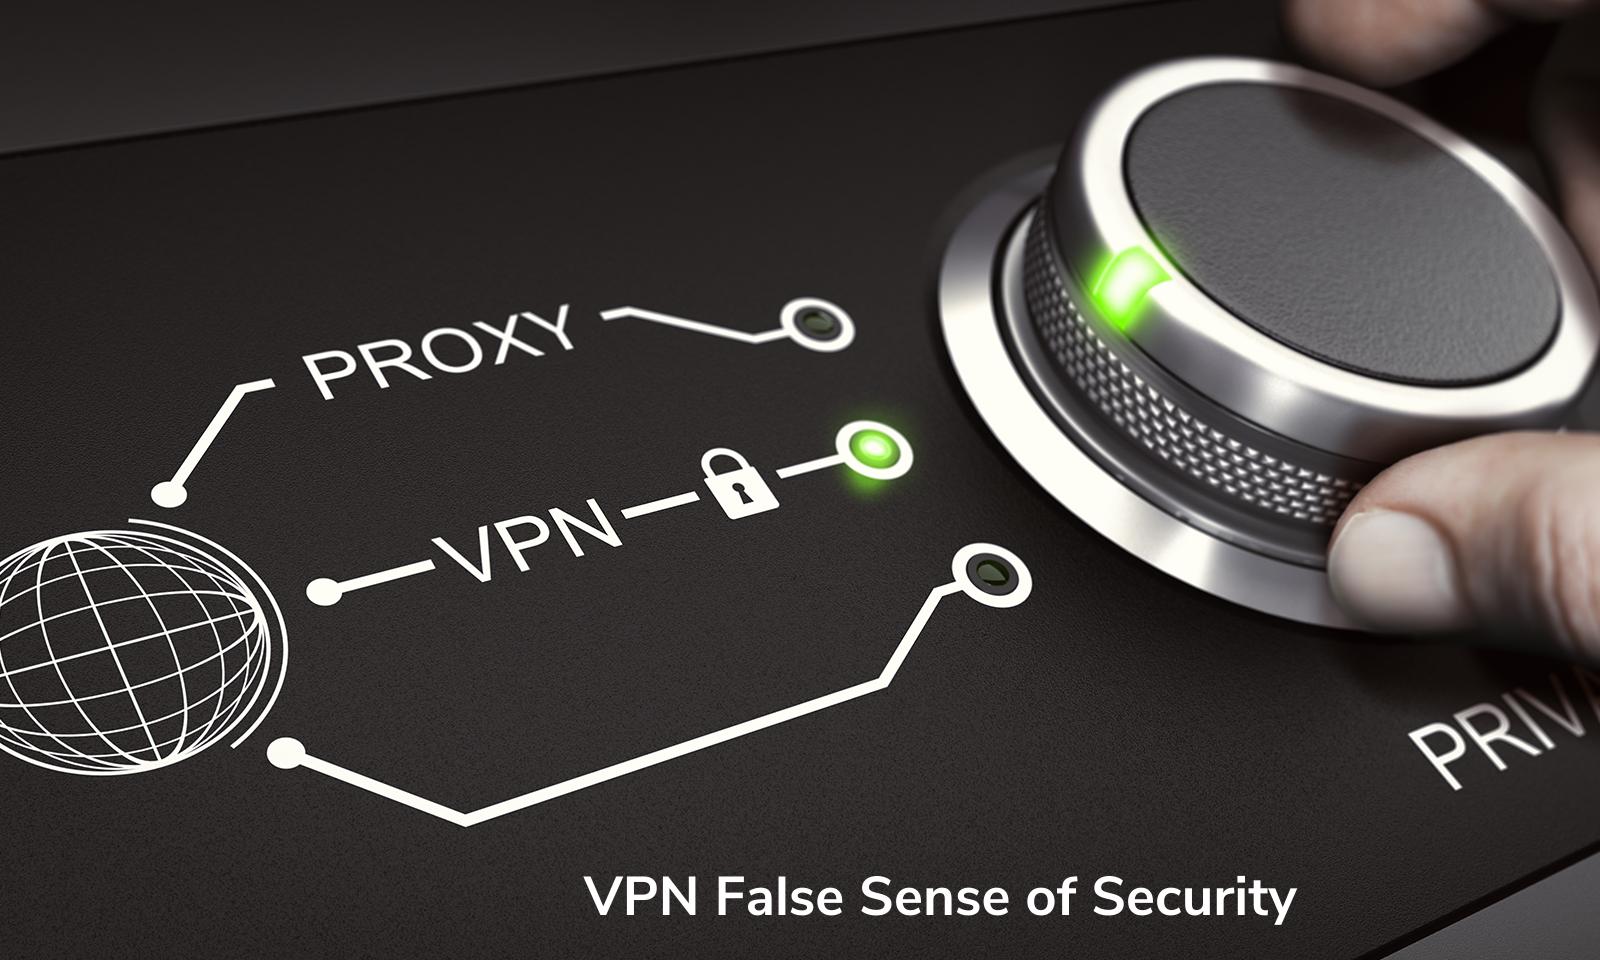 VPN False Sense of Security